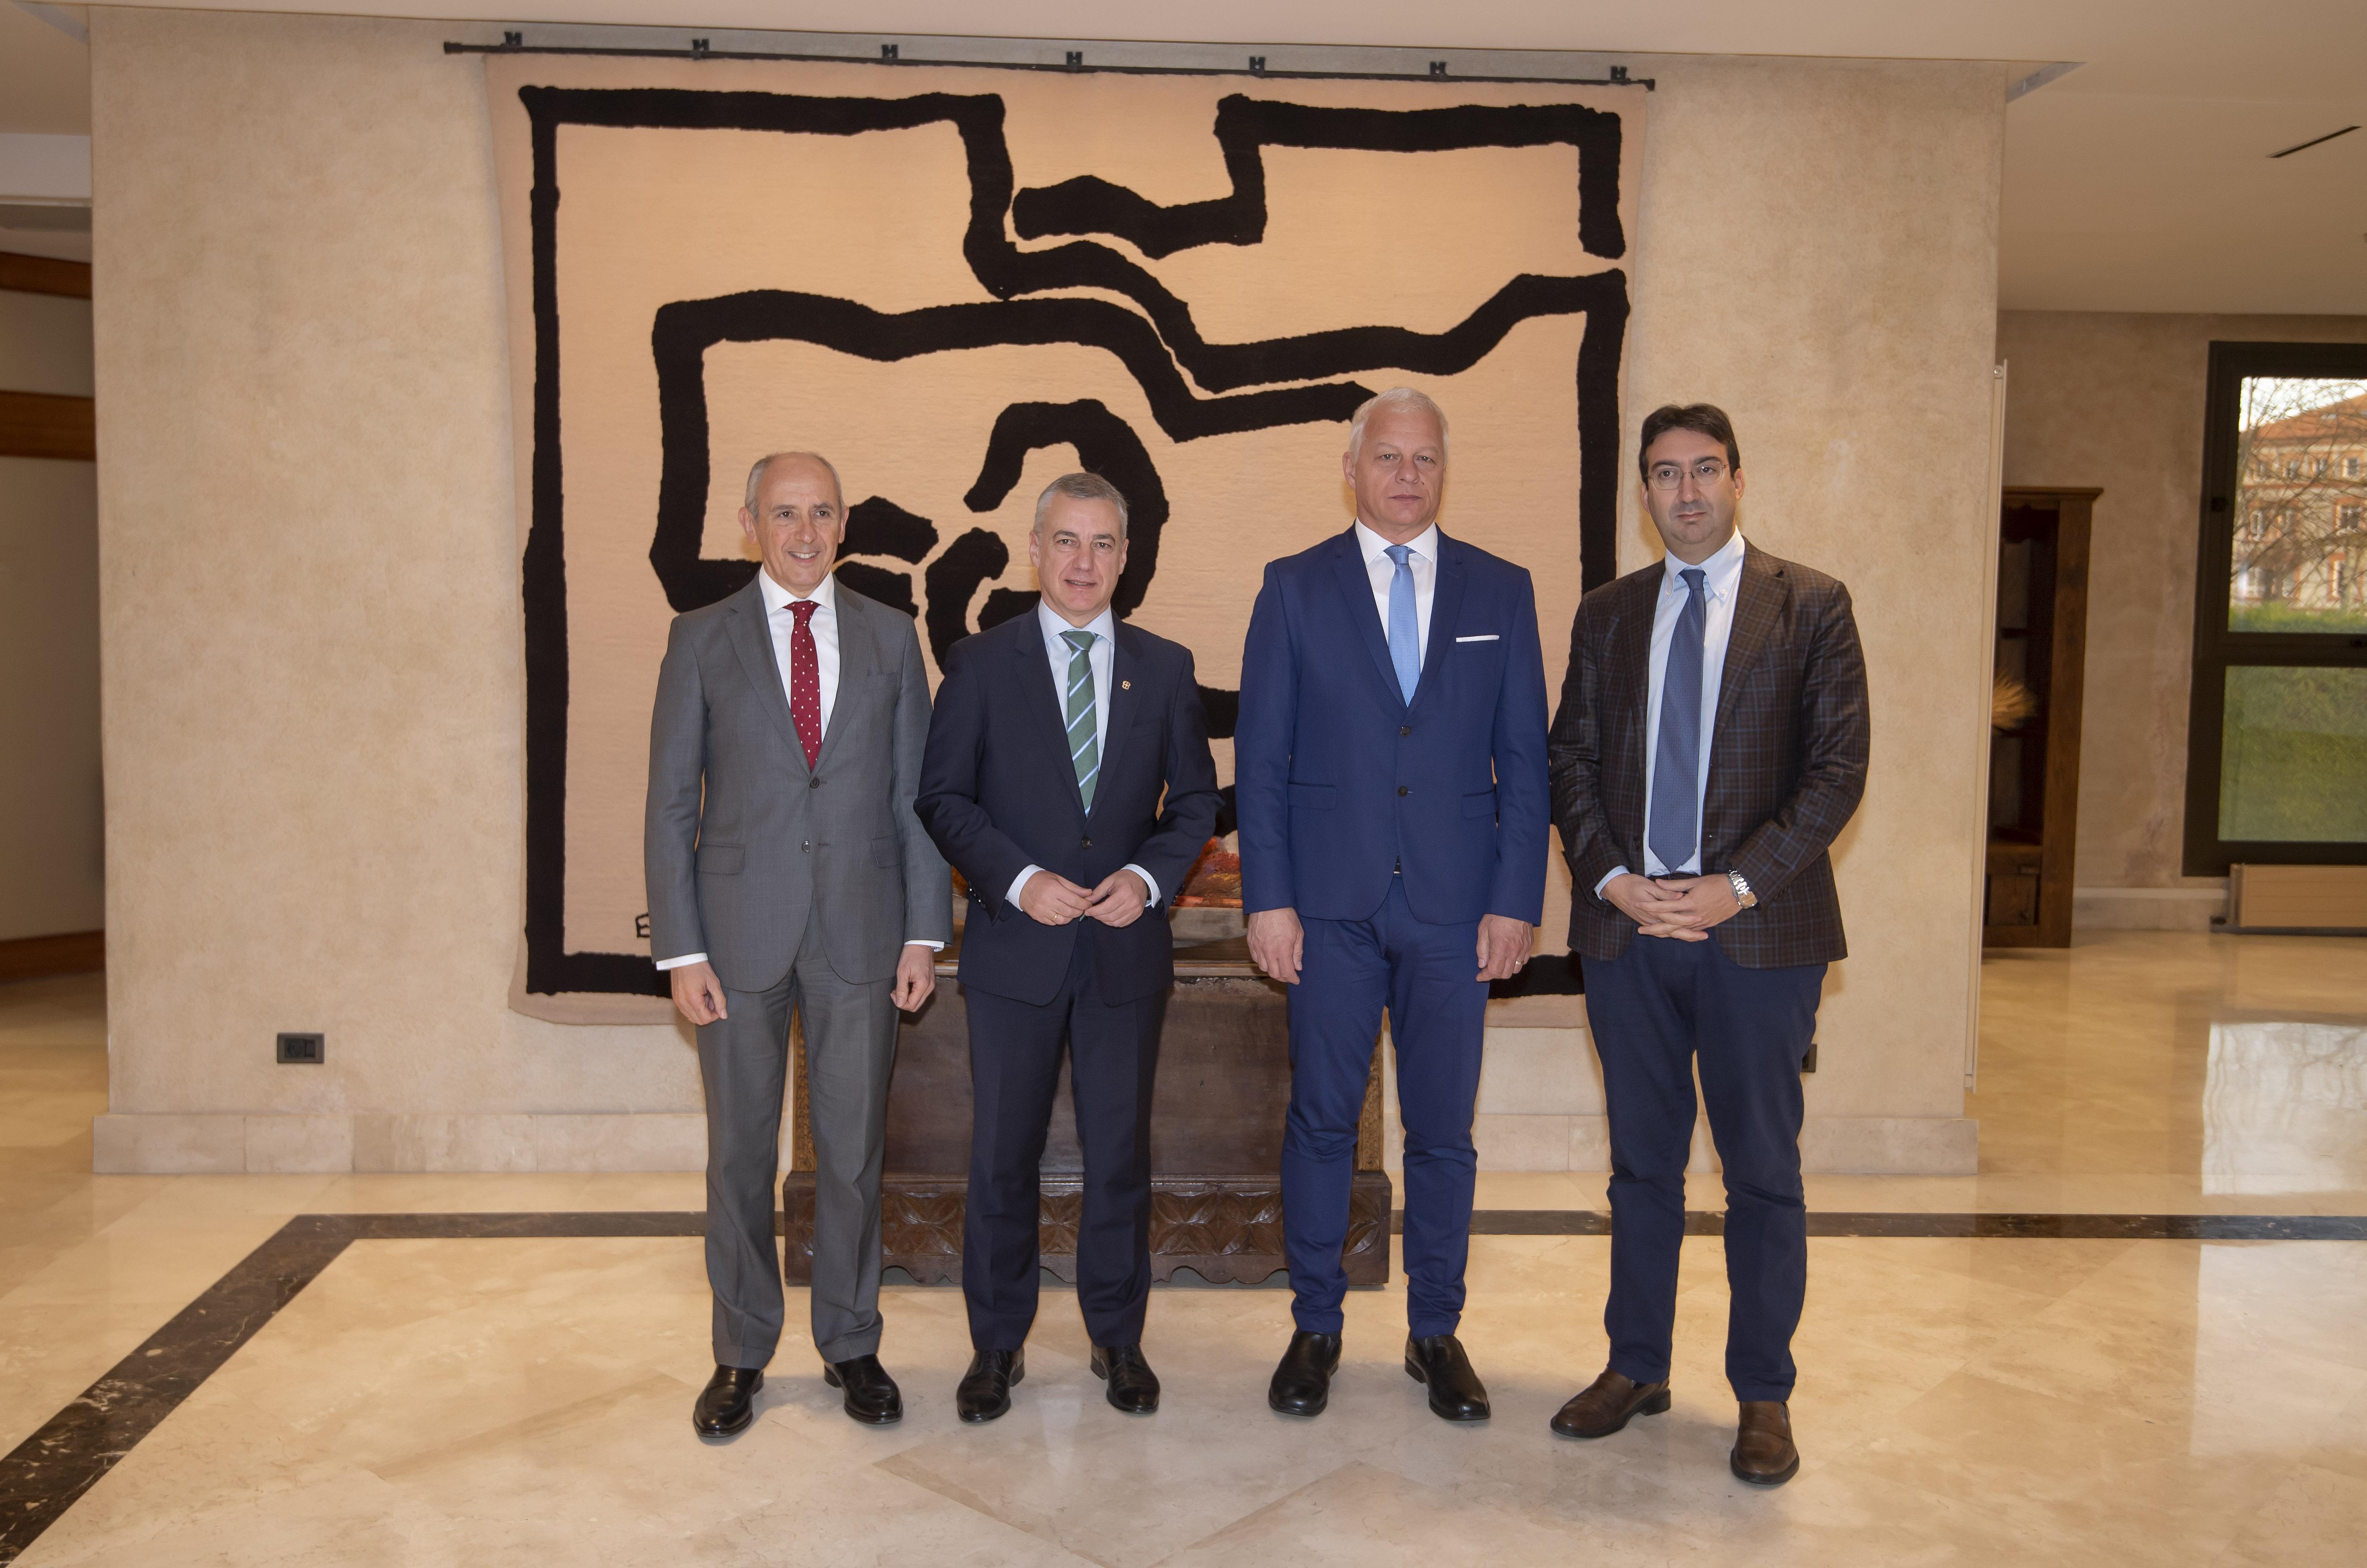 El Lehendakari recibe a responsables del grupo GRECO y de la OCDE  [0:57]